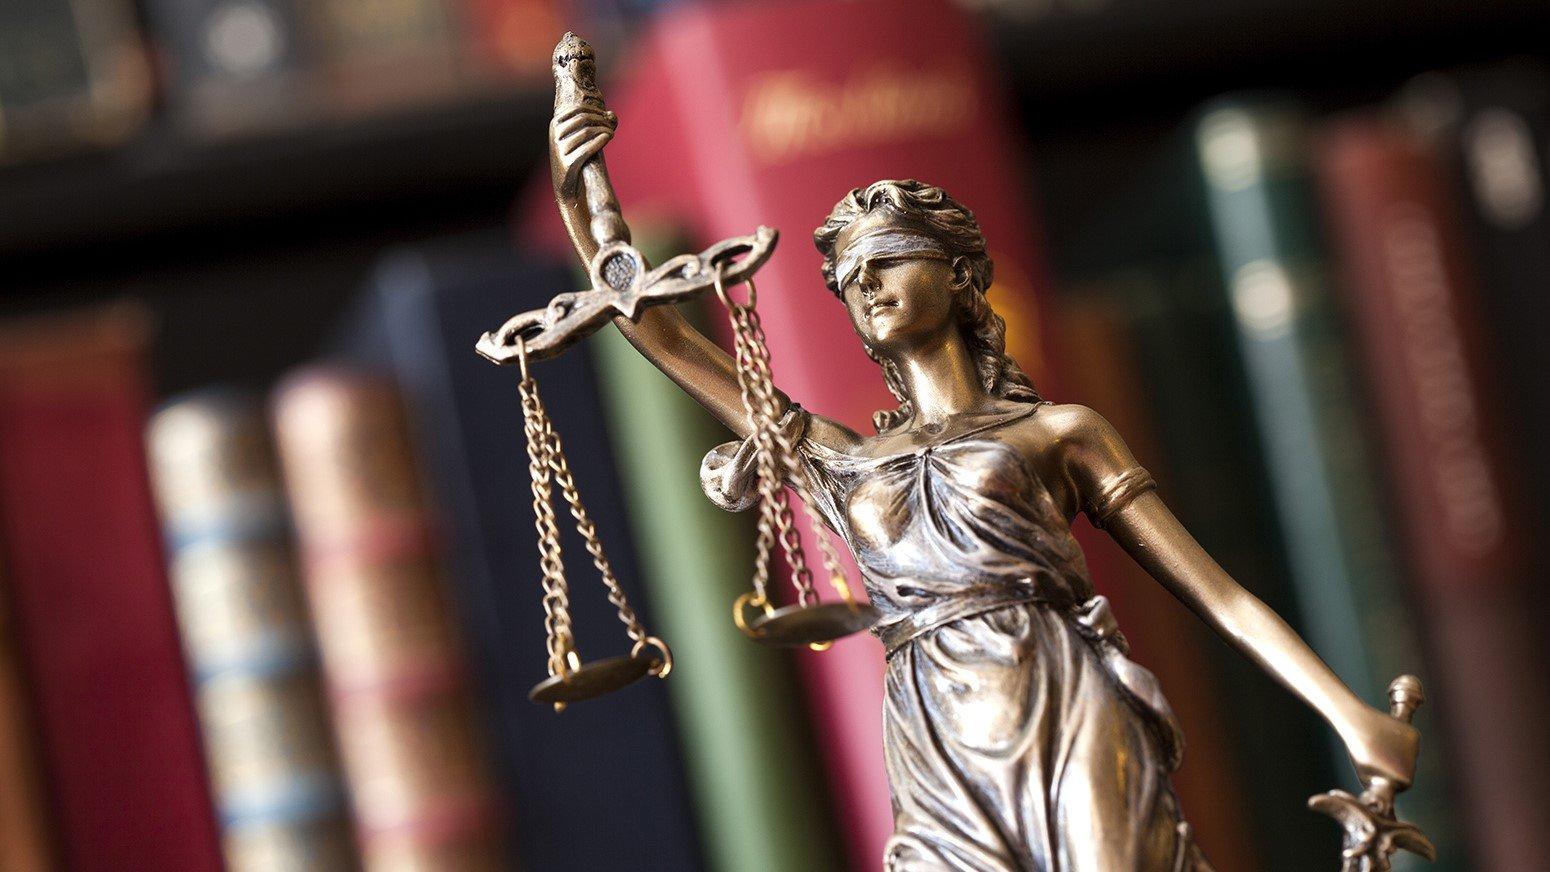 Три суда стран Бенилюкса приняли противоречивые решения по делу Стати - Минюст Казахстана